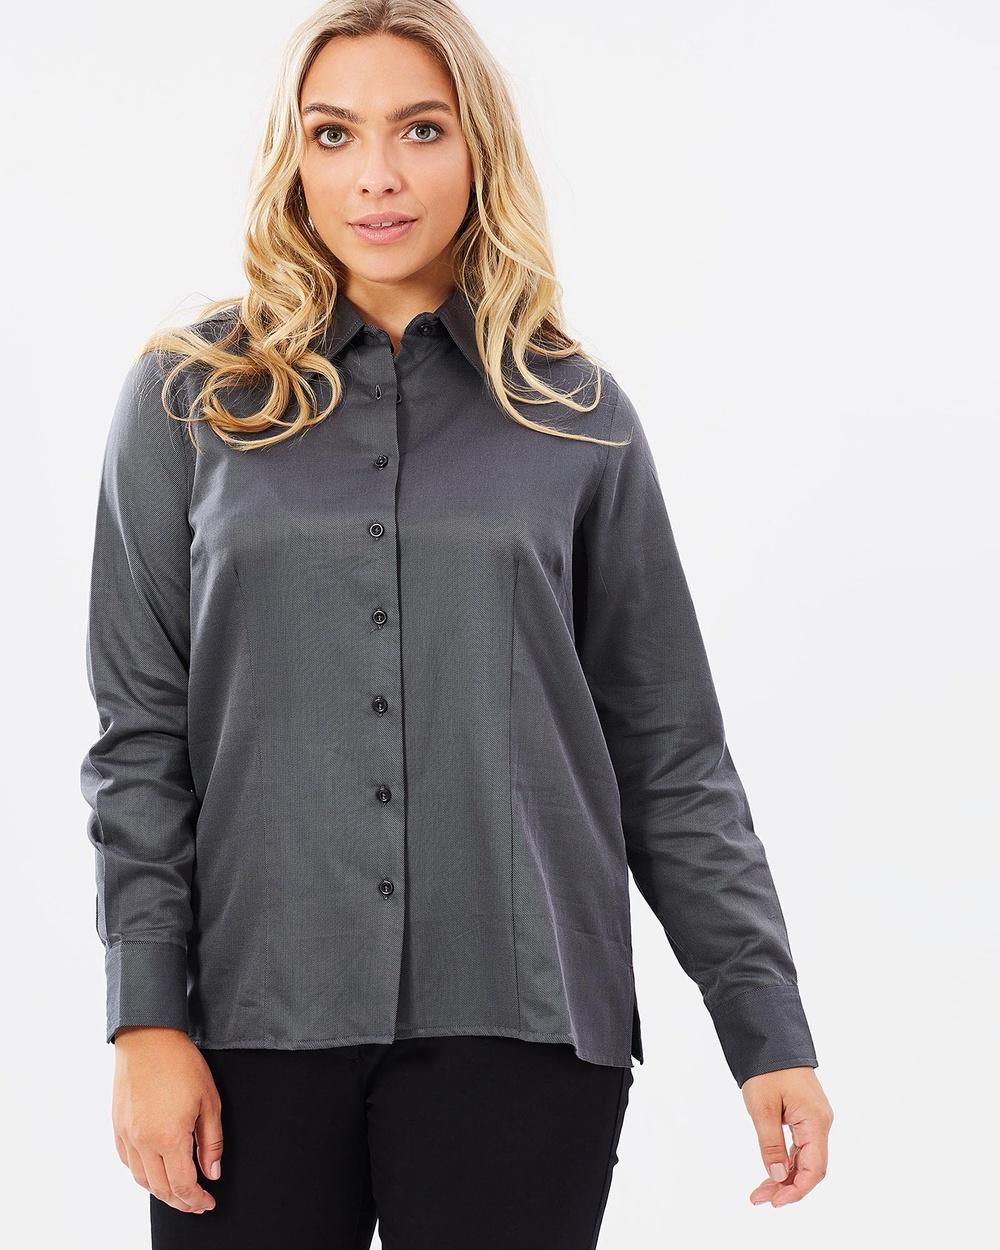 Alison Dominy Andrea Shirt Tops Black/Silver Andrea Shirt